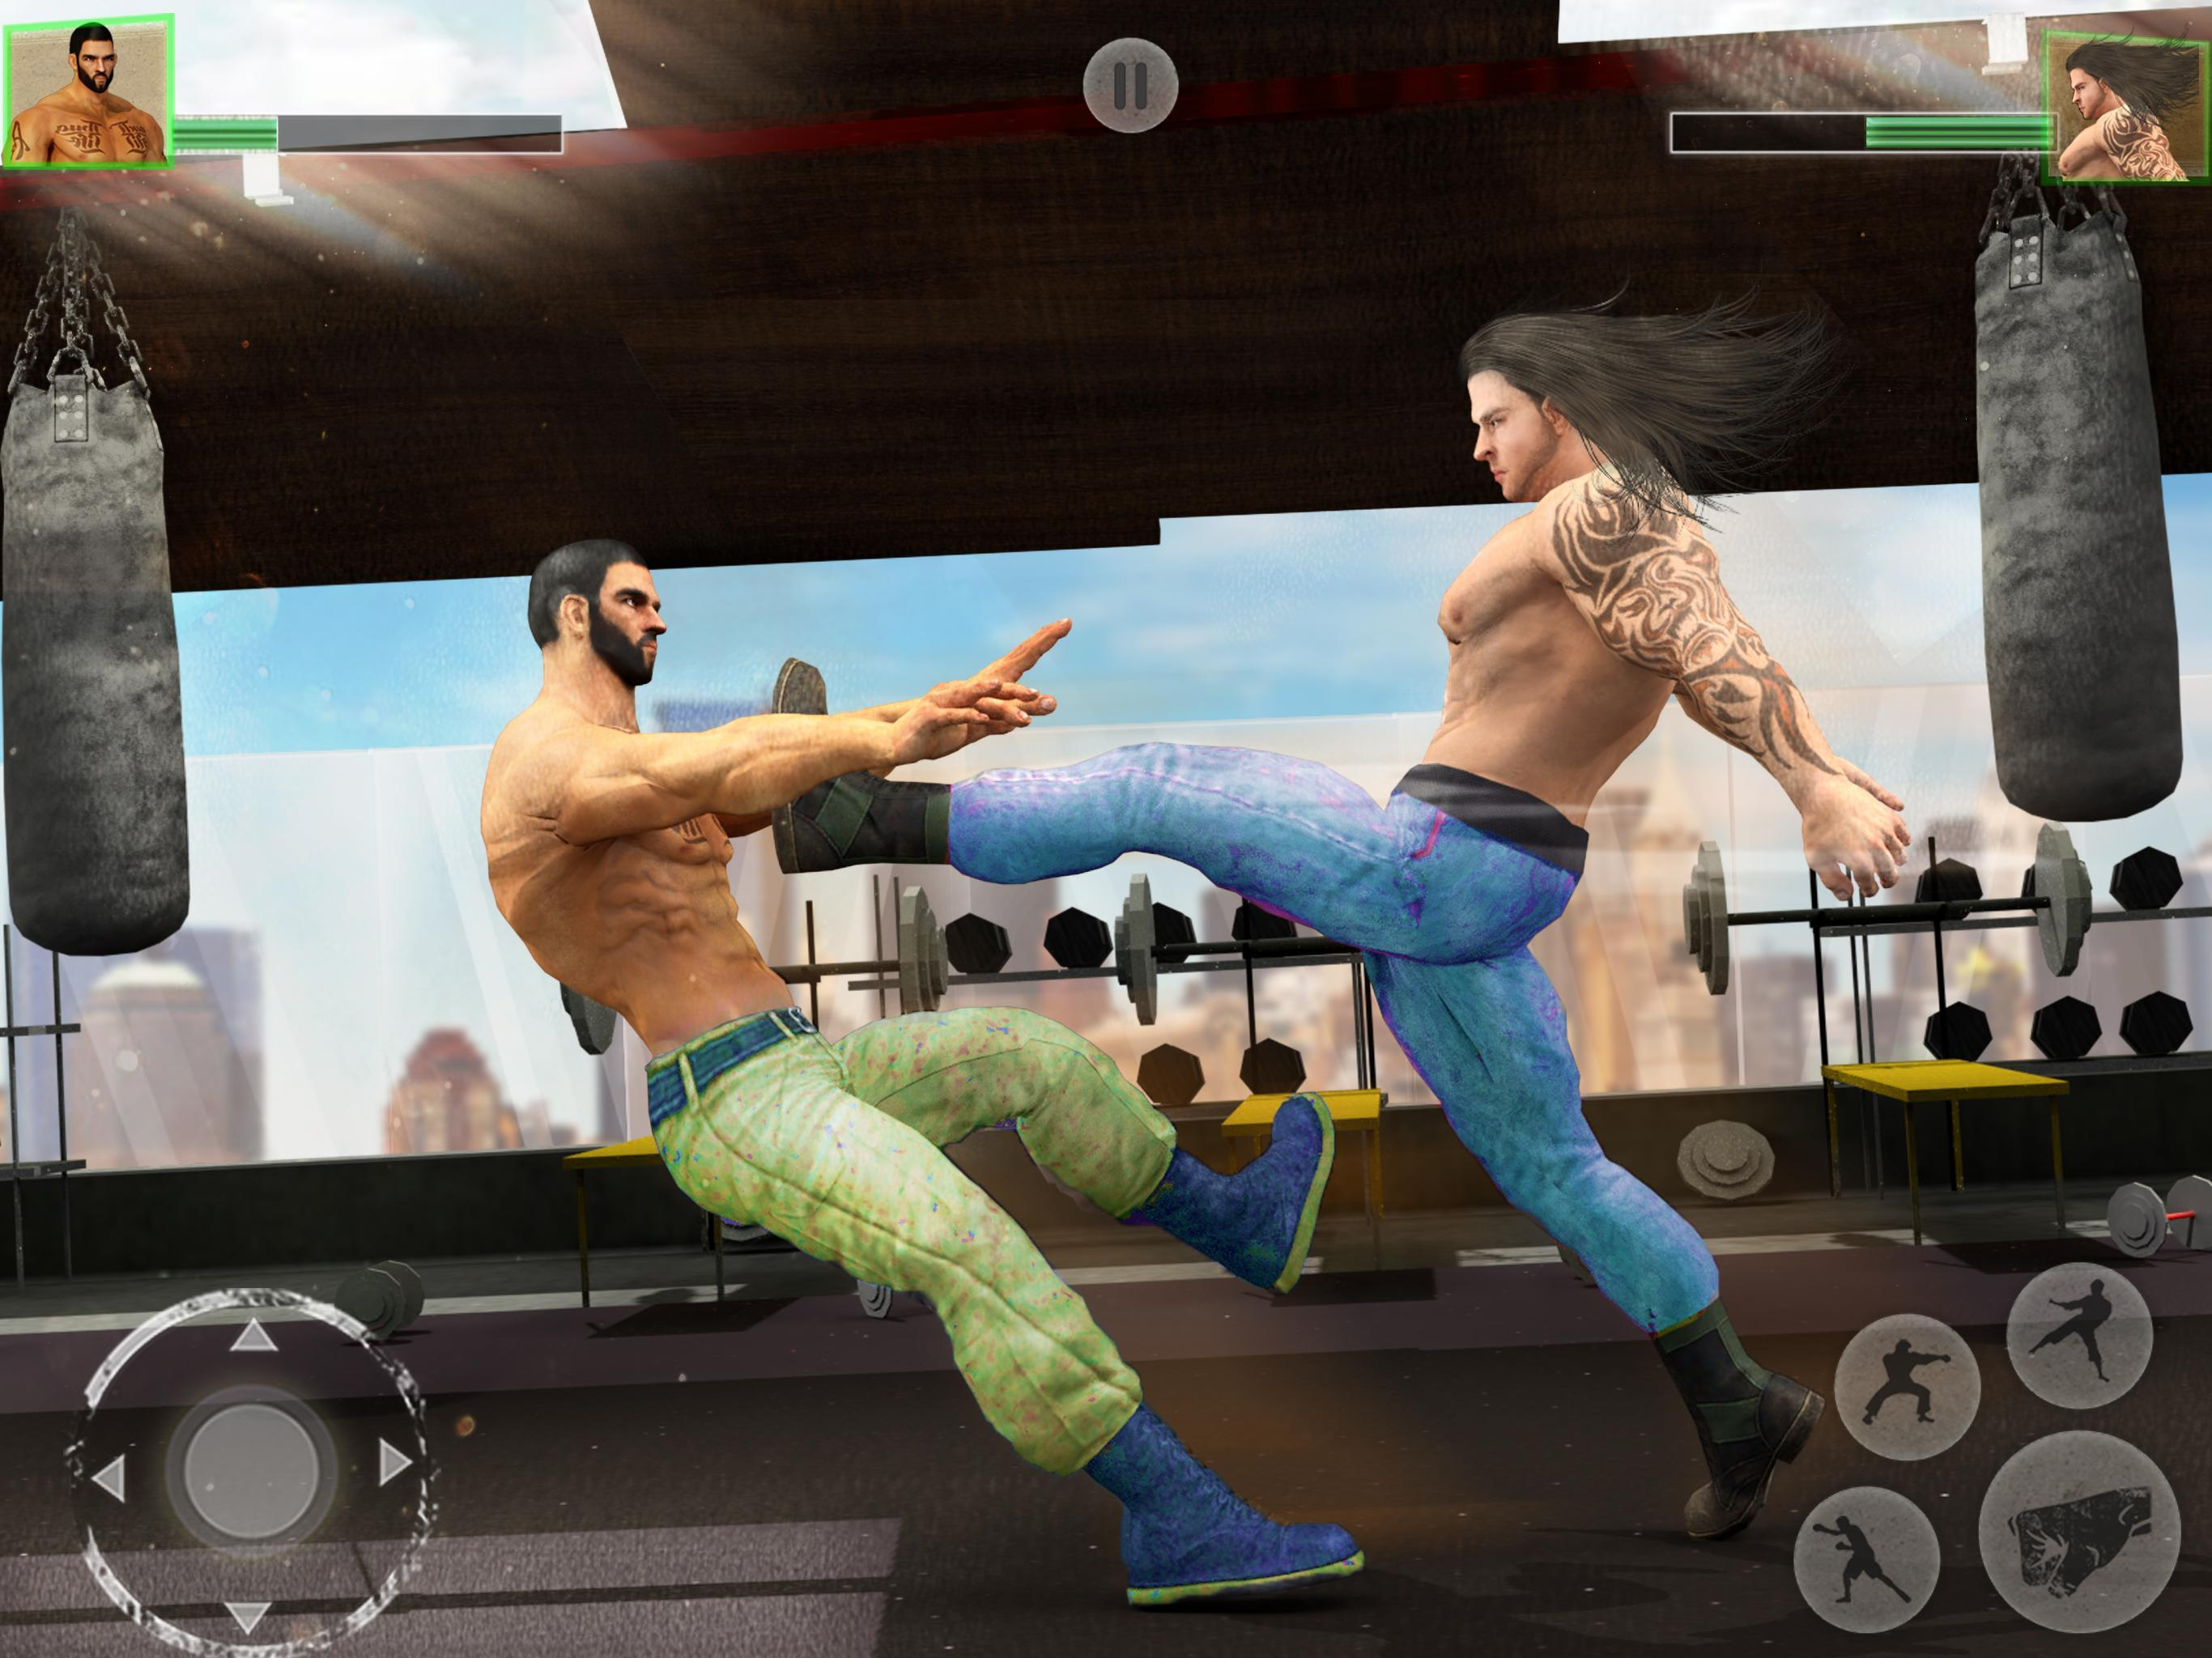 Bodybuilder Fighting Club 2019: Wrestling Games 1.1.4 Screenshot 9